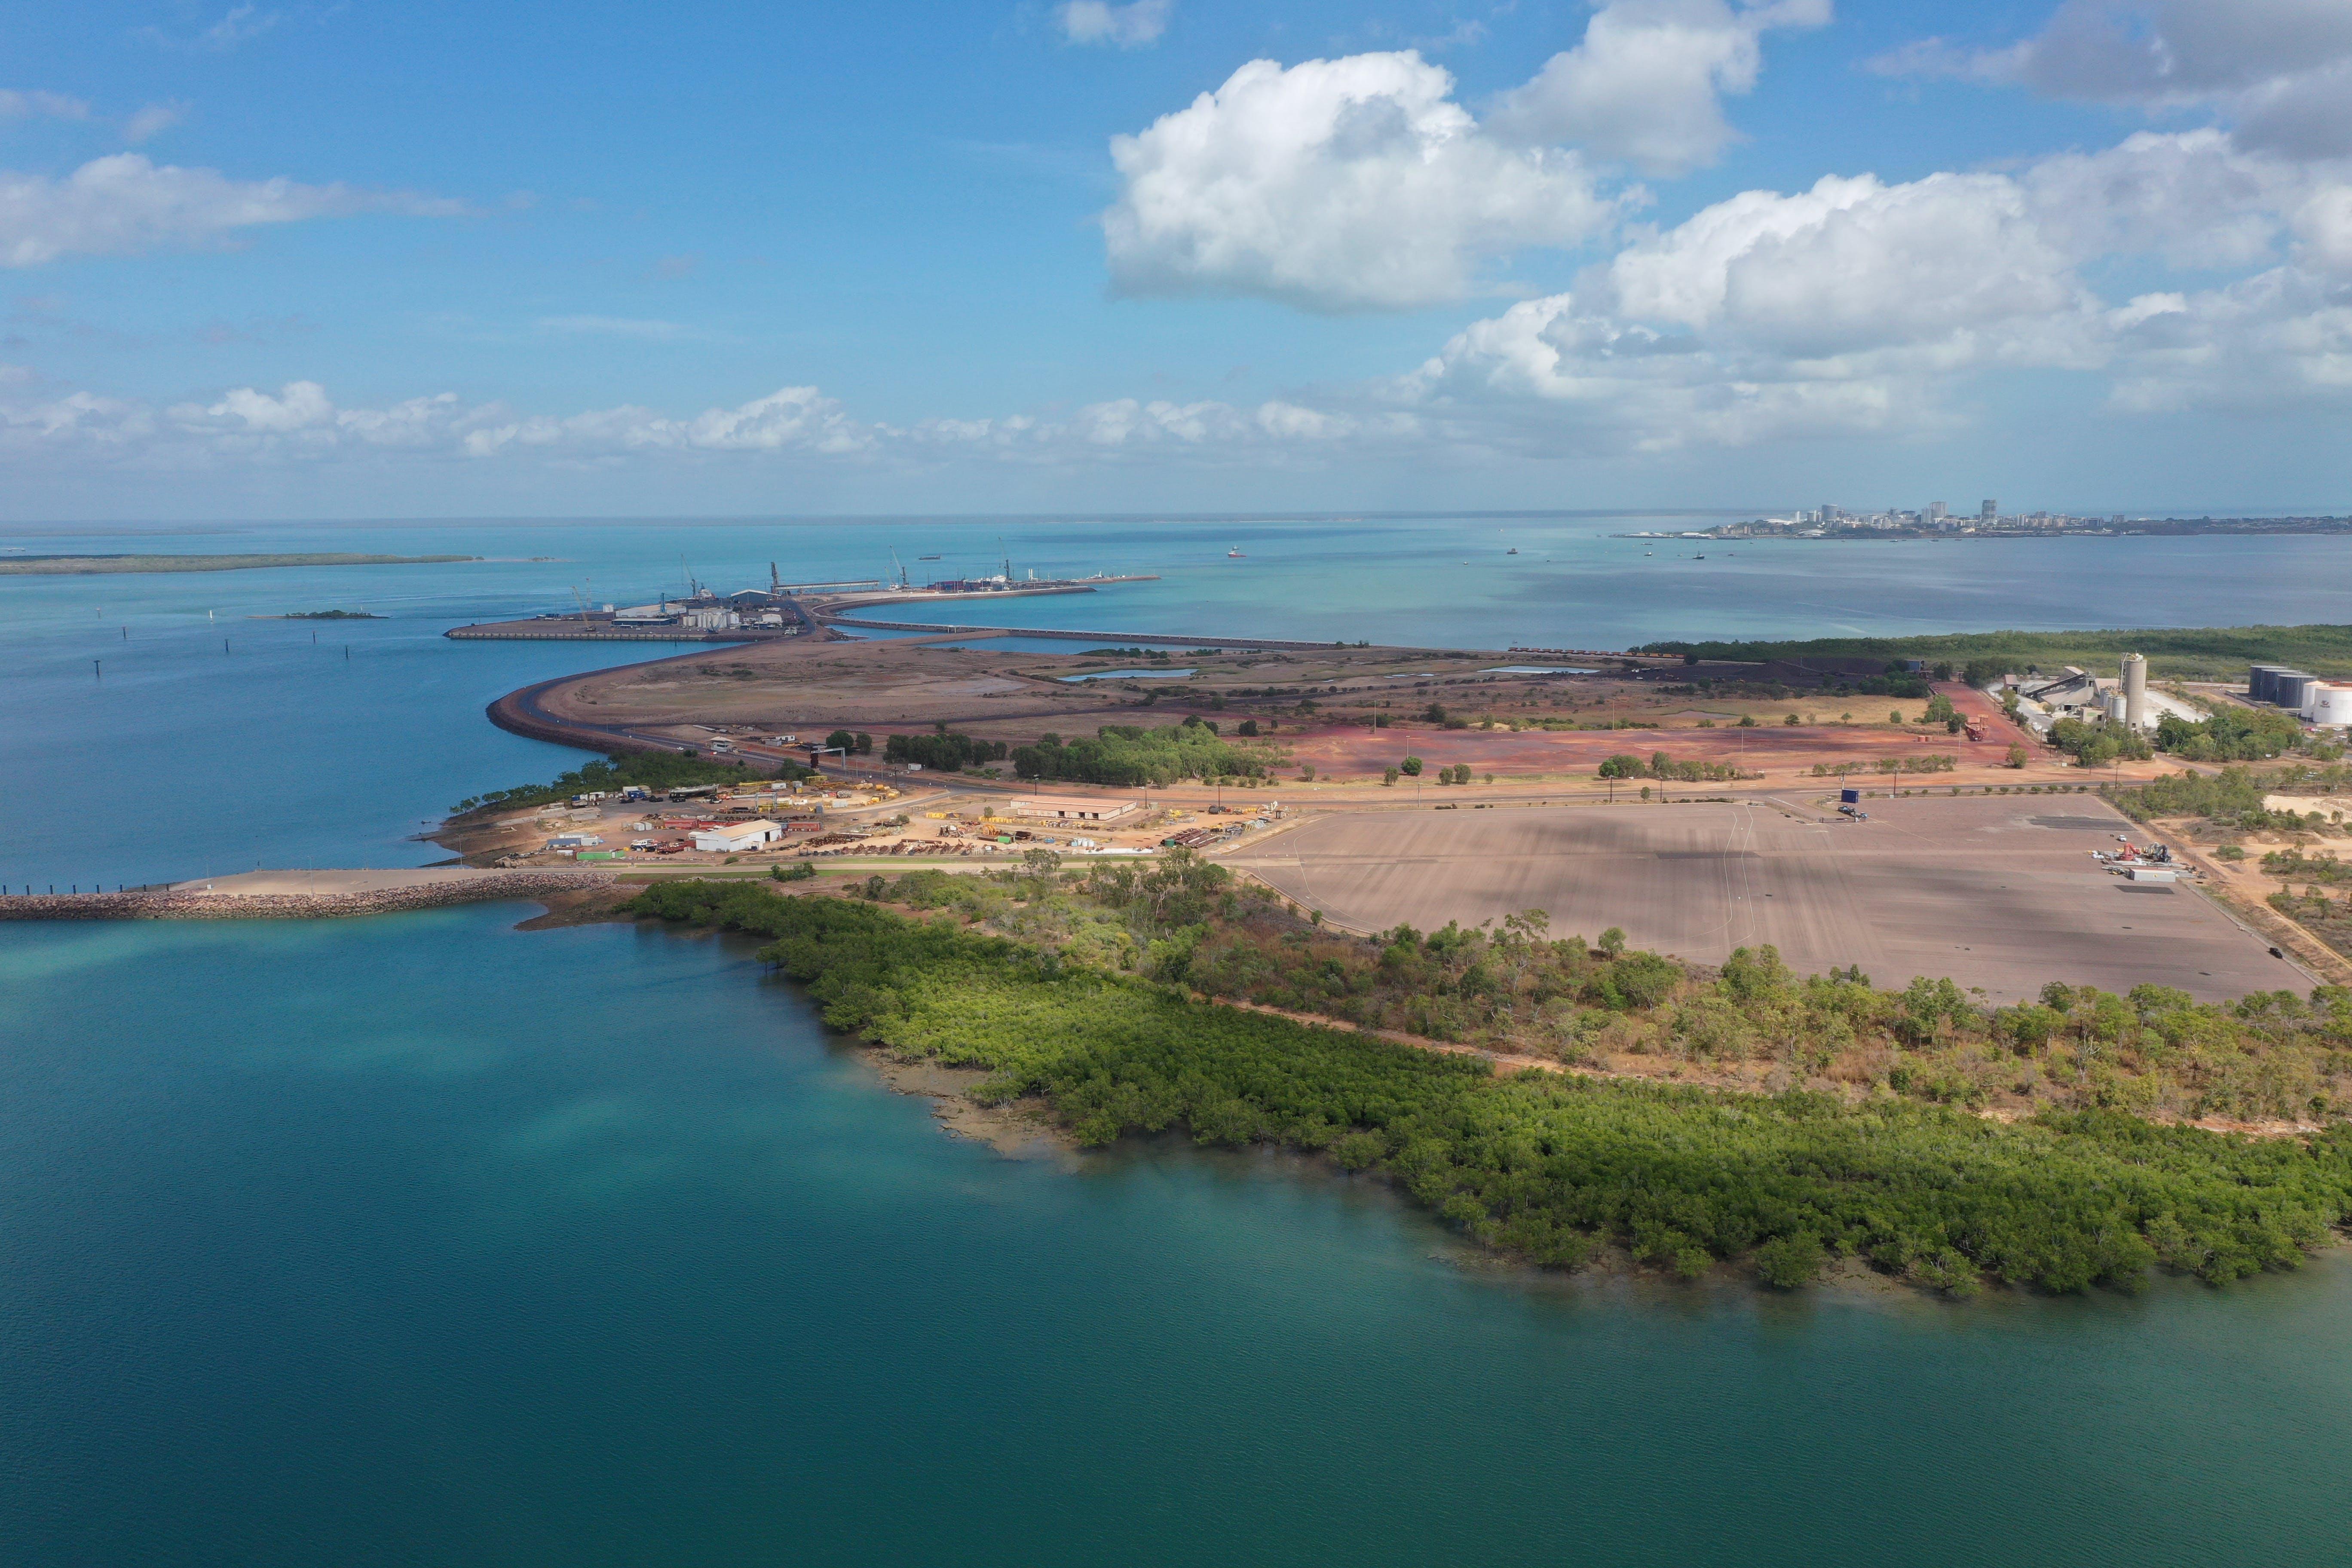 Marine Industry Park, East Arm, Darwin, Northern Territory